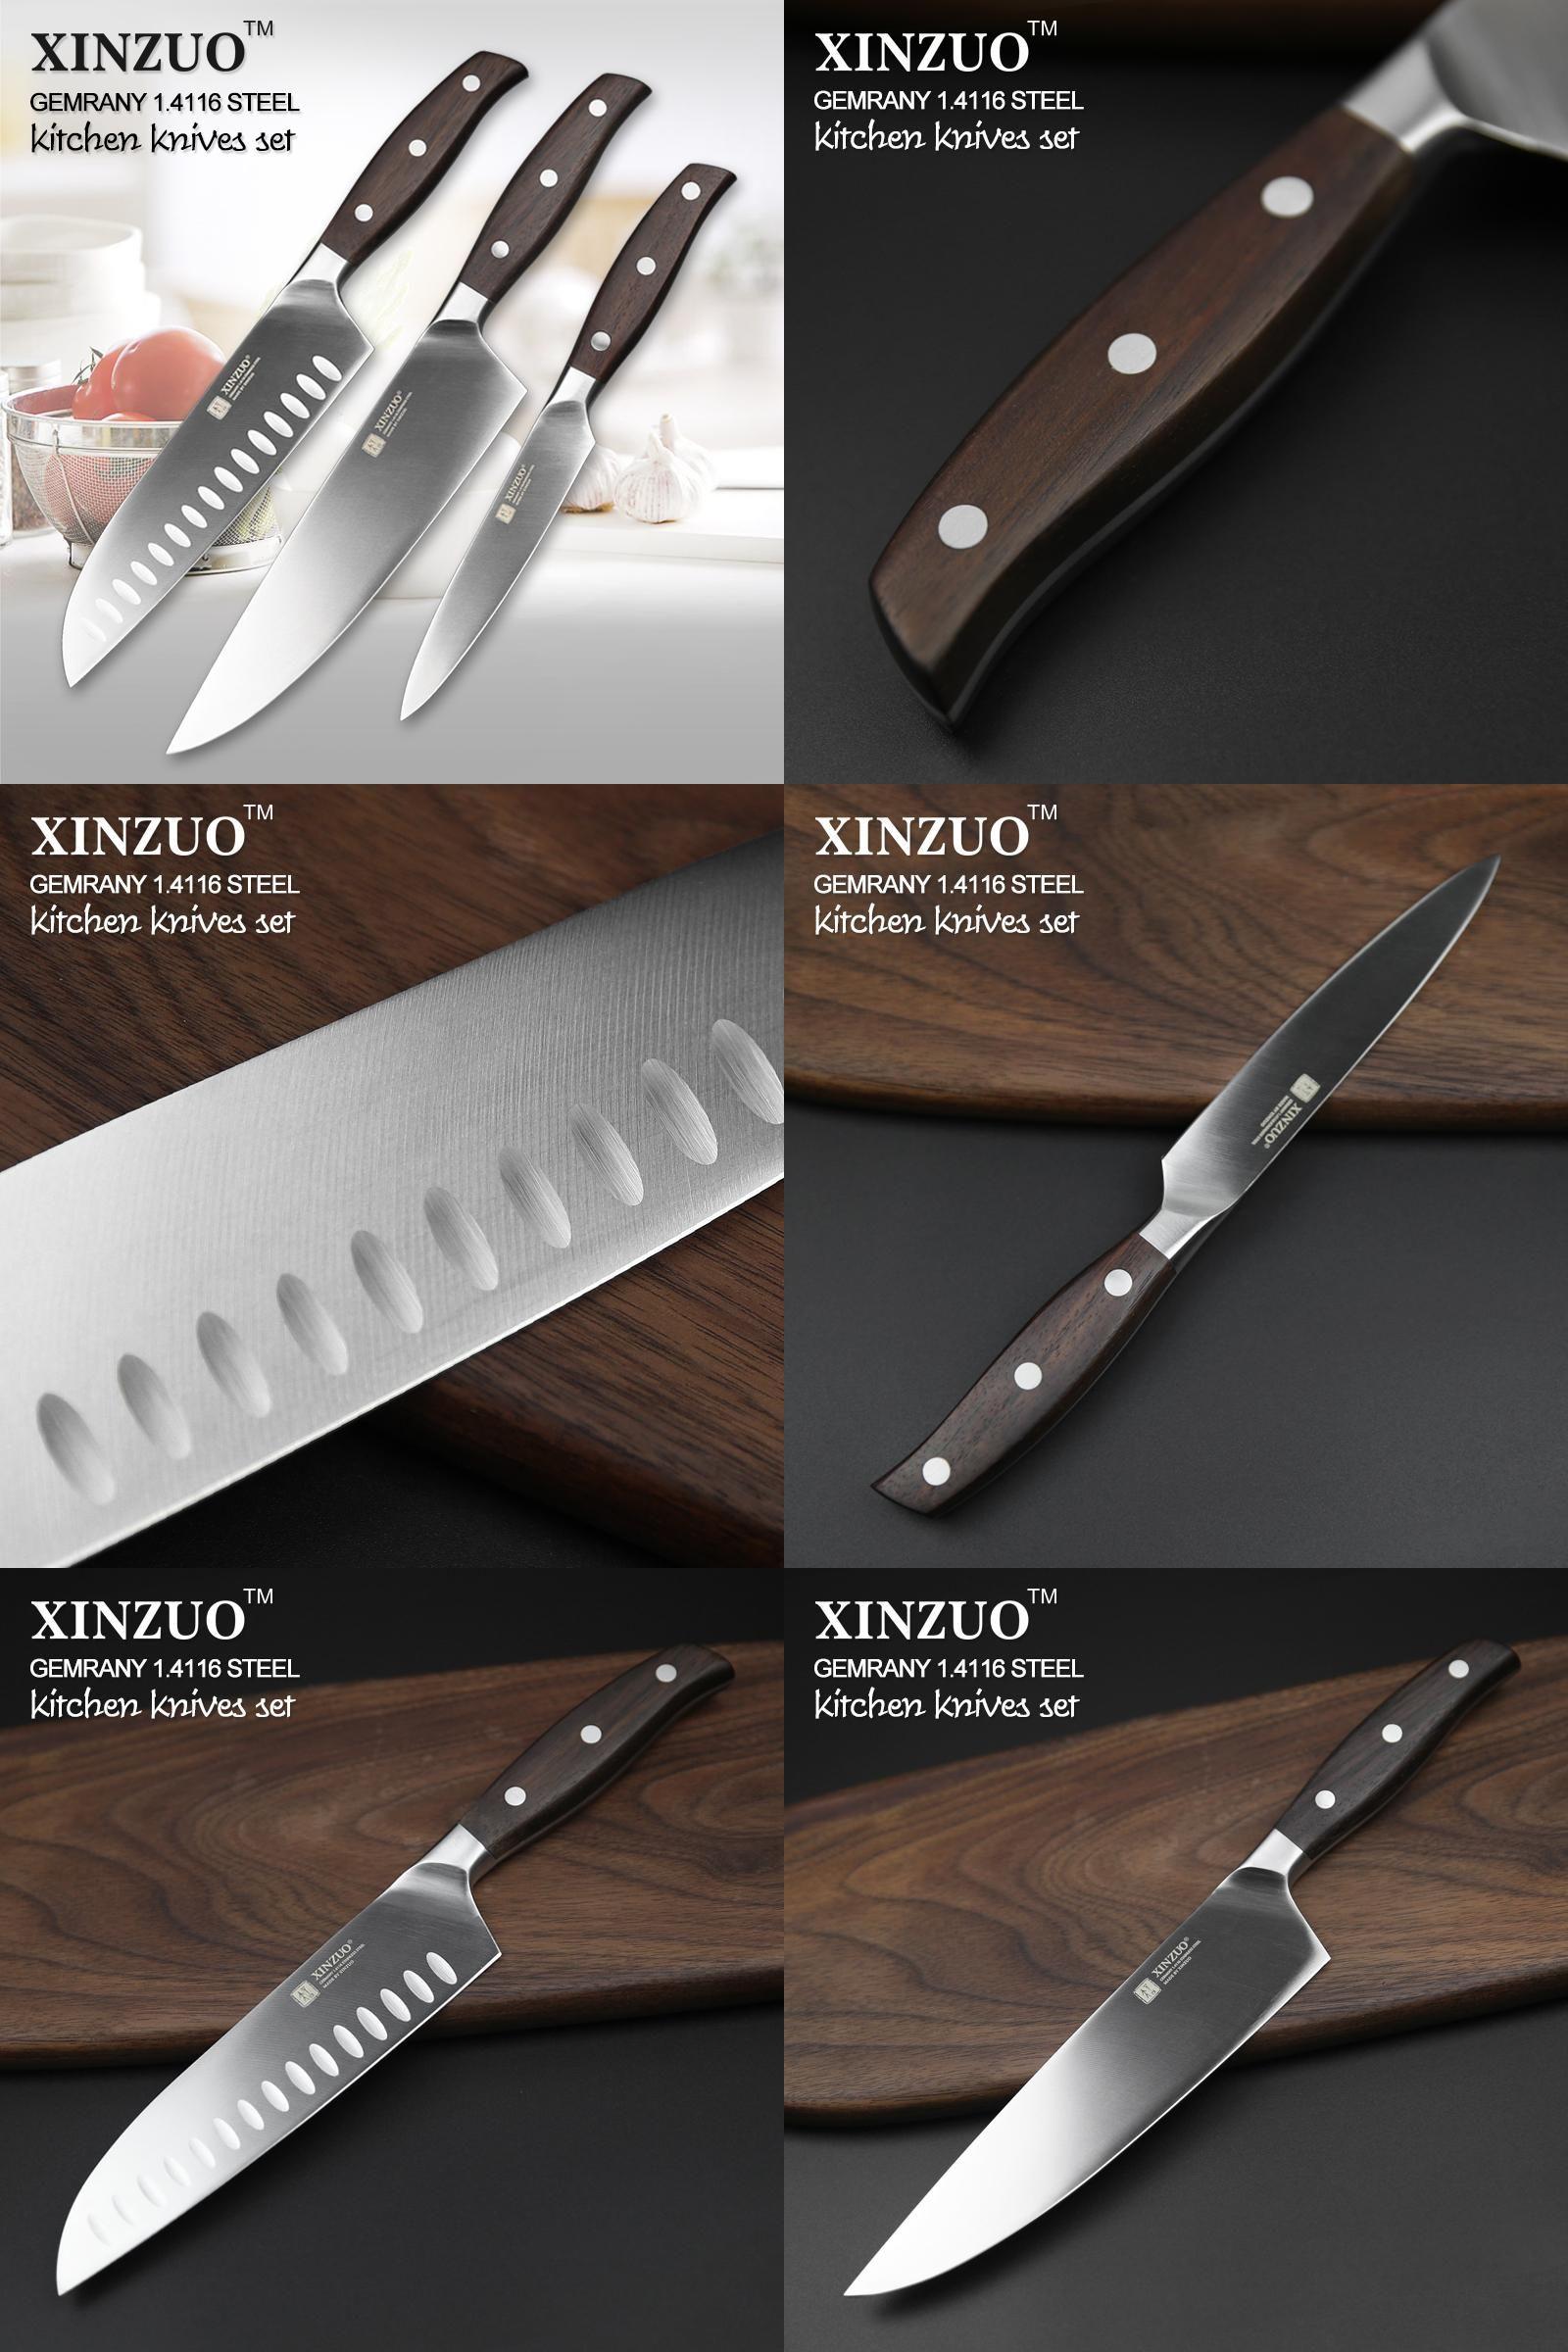 visit to buy xinzuo kitchen tools 3 pcs kitchen knife set utility